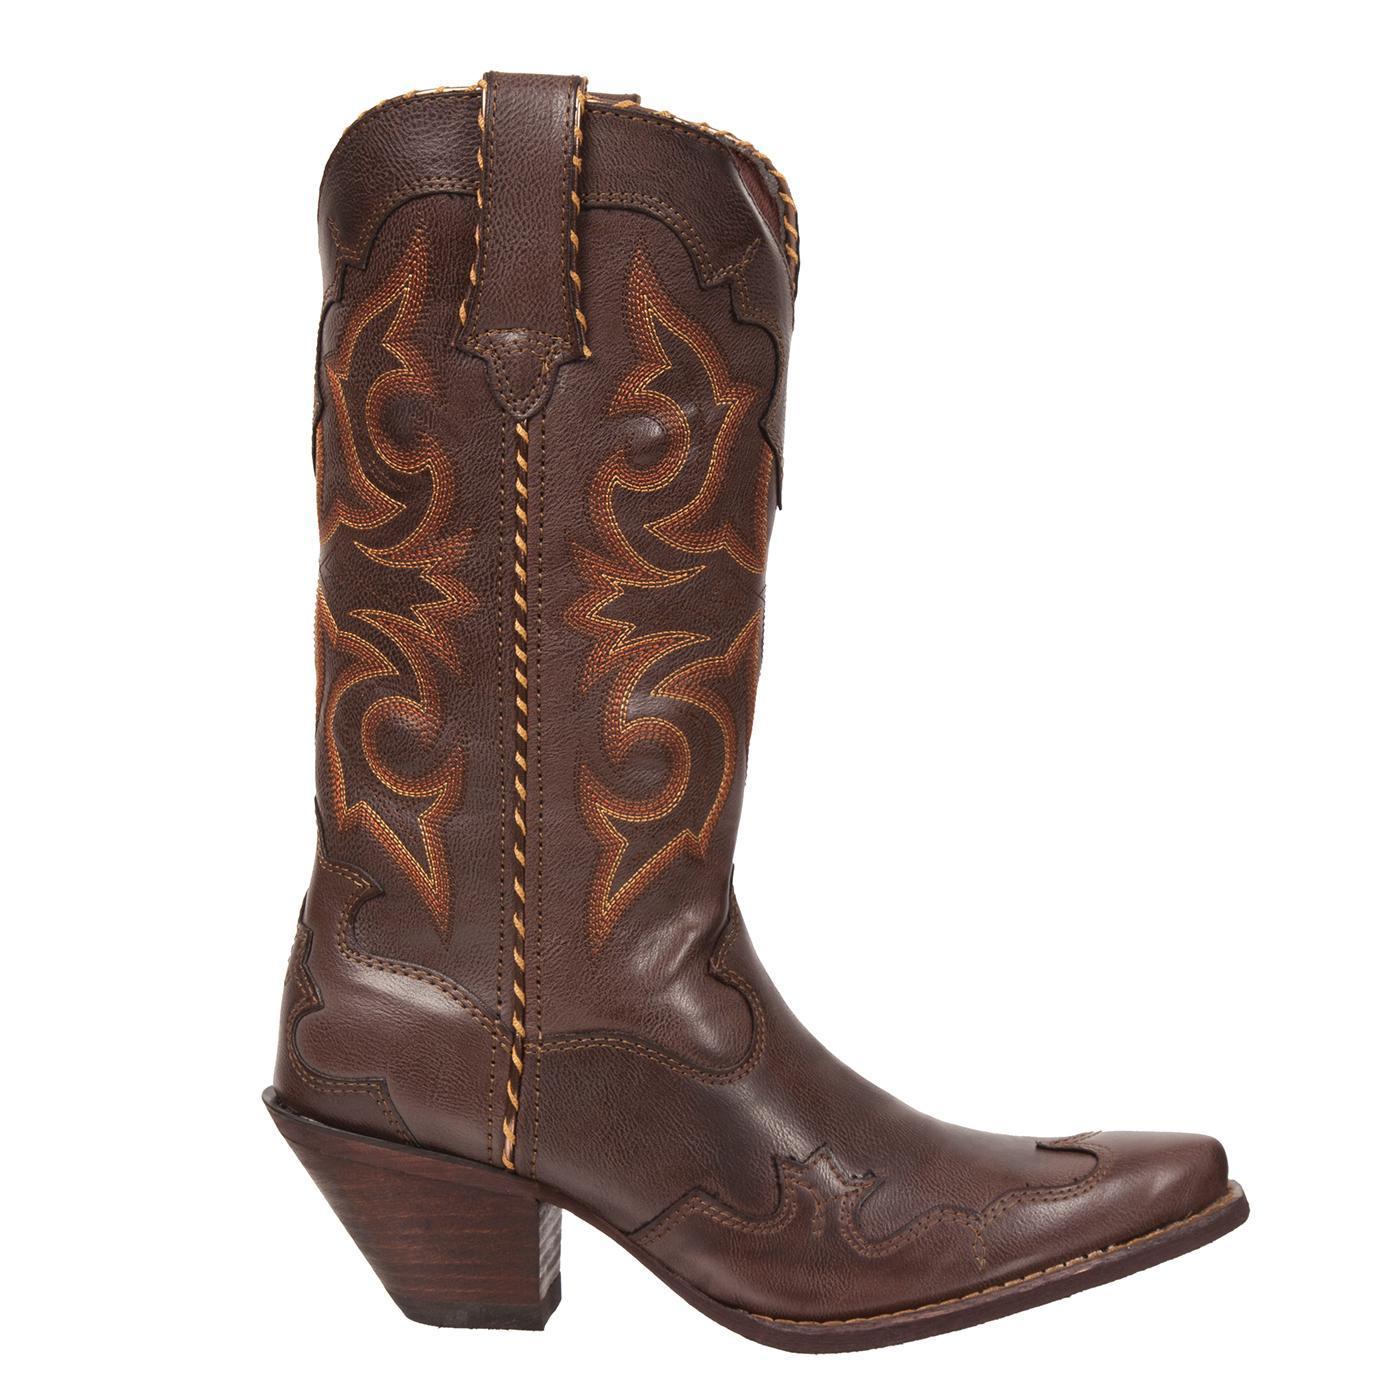 Fantastic Durango Womenu0026#39;s Rebel Blush N Lace Saddle10u0026quot; Western Boots Pink RD3474 Size 9.5M | EBay